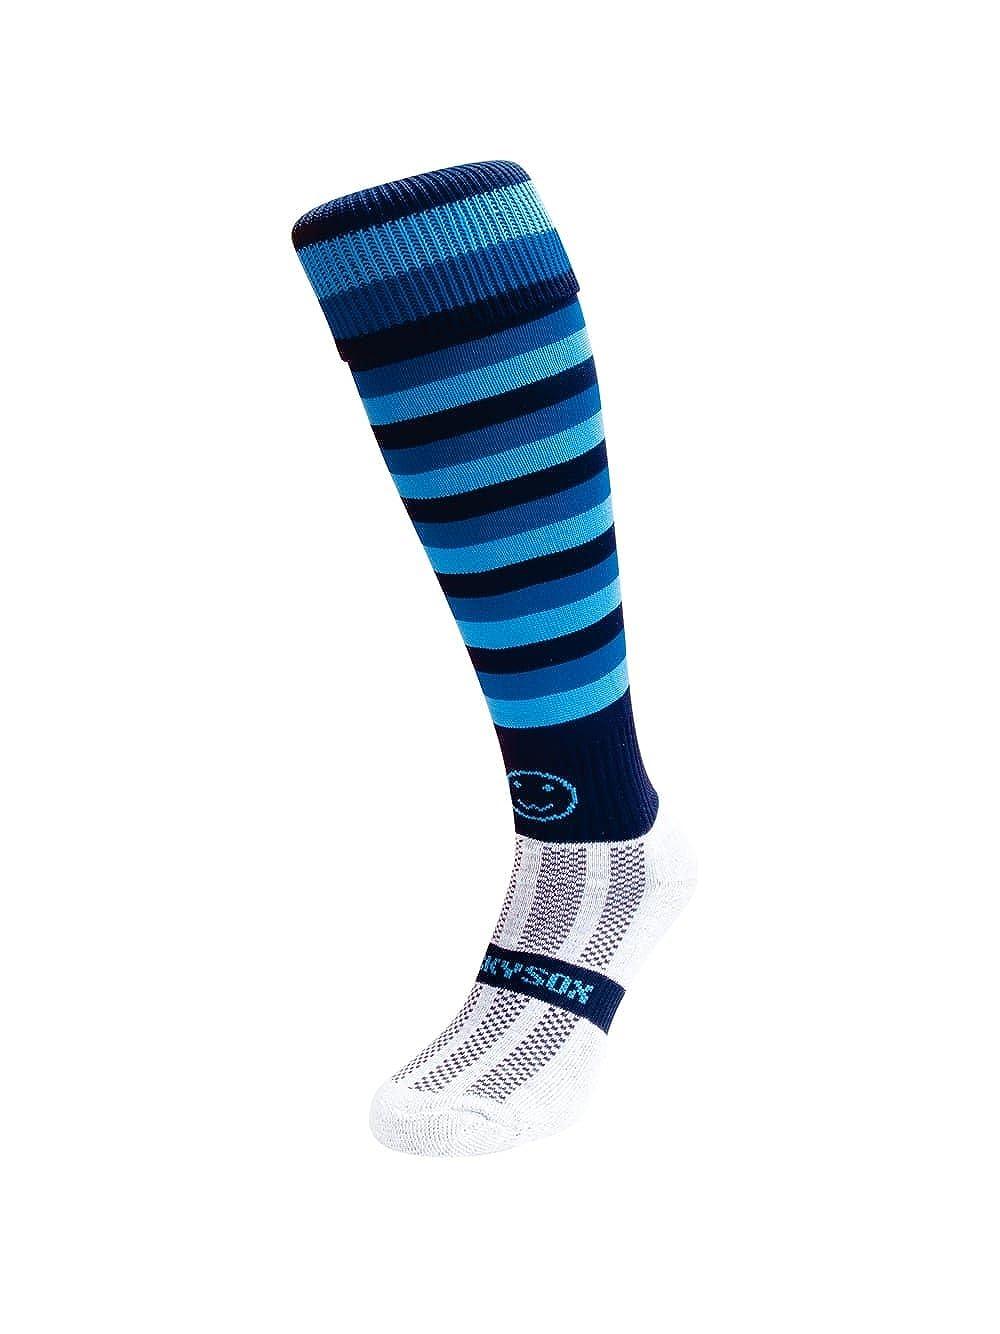 WackySox Micro Hoops Knee Length Rugby Hockey and Football Sports Socks